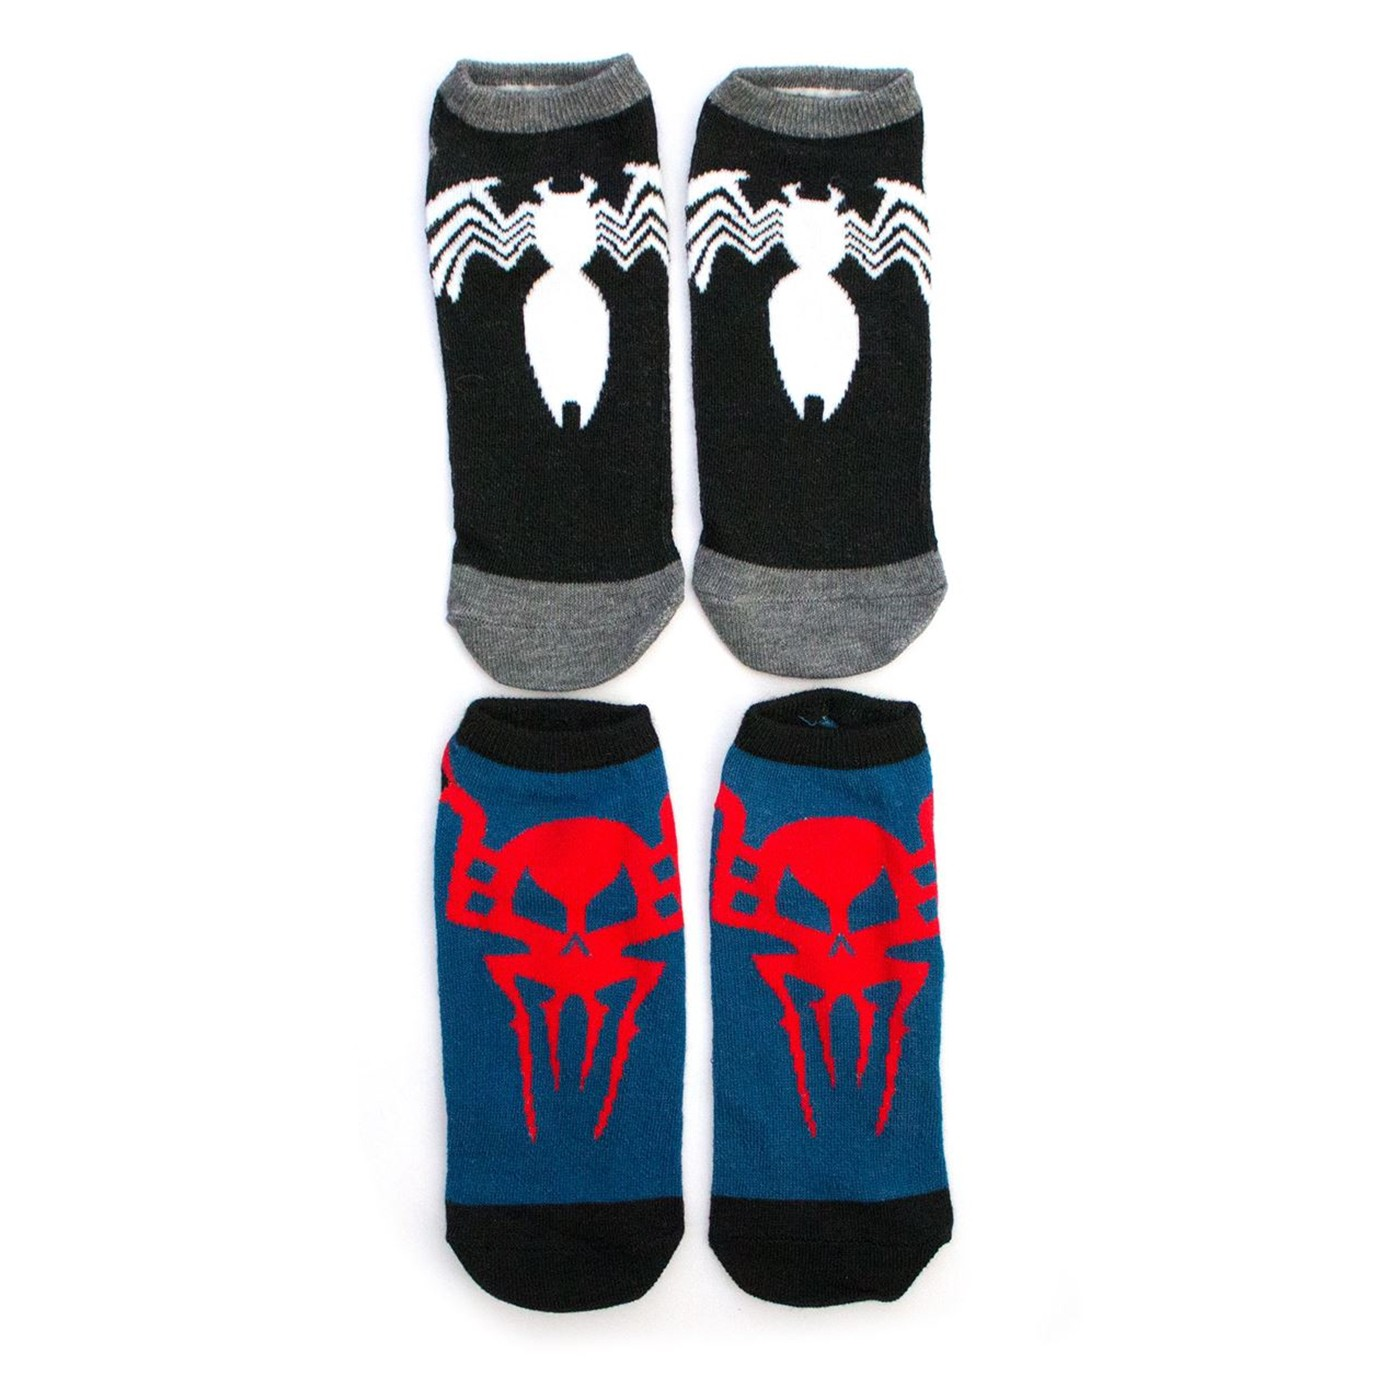 Venom and Spider-Man 2-pack Women's Ankle socks